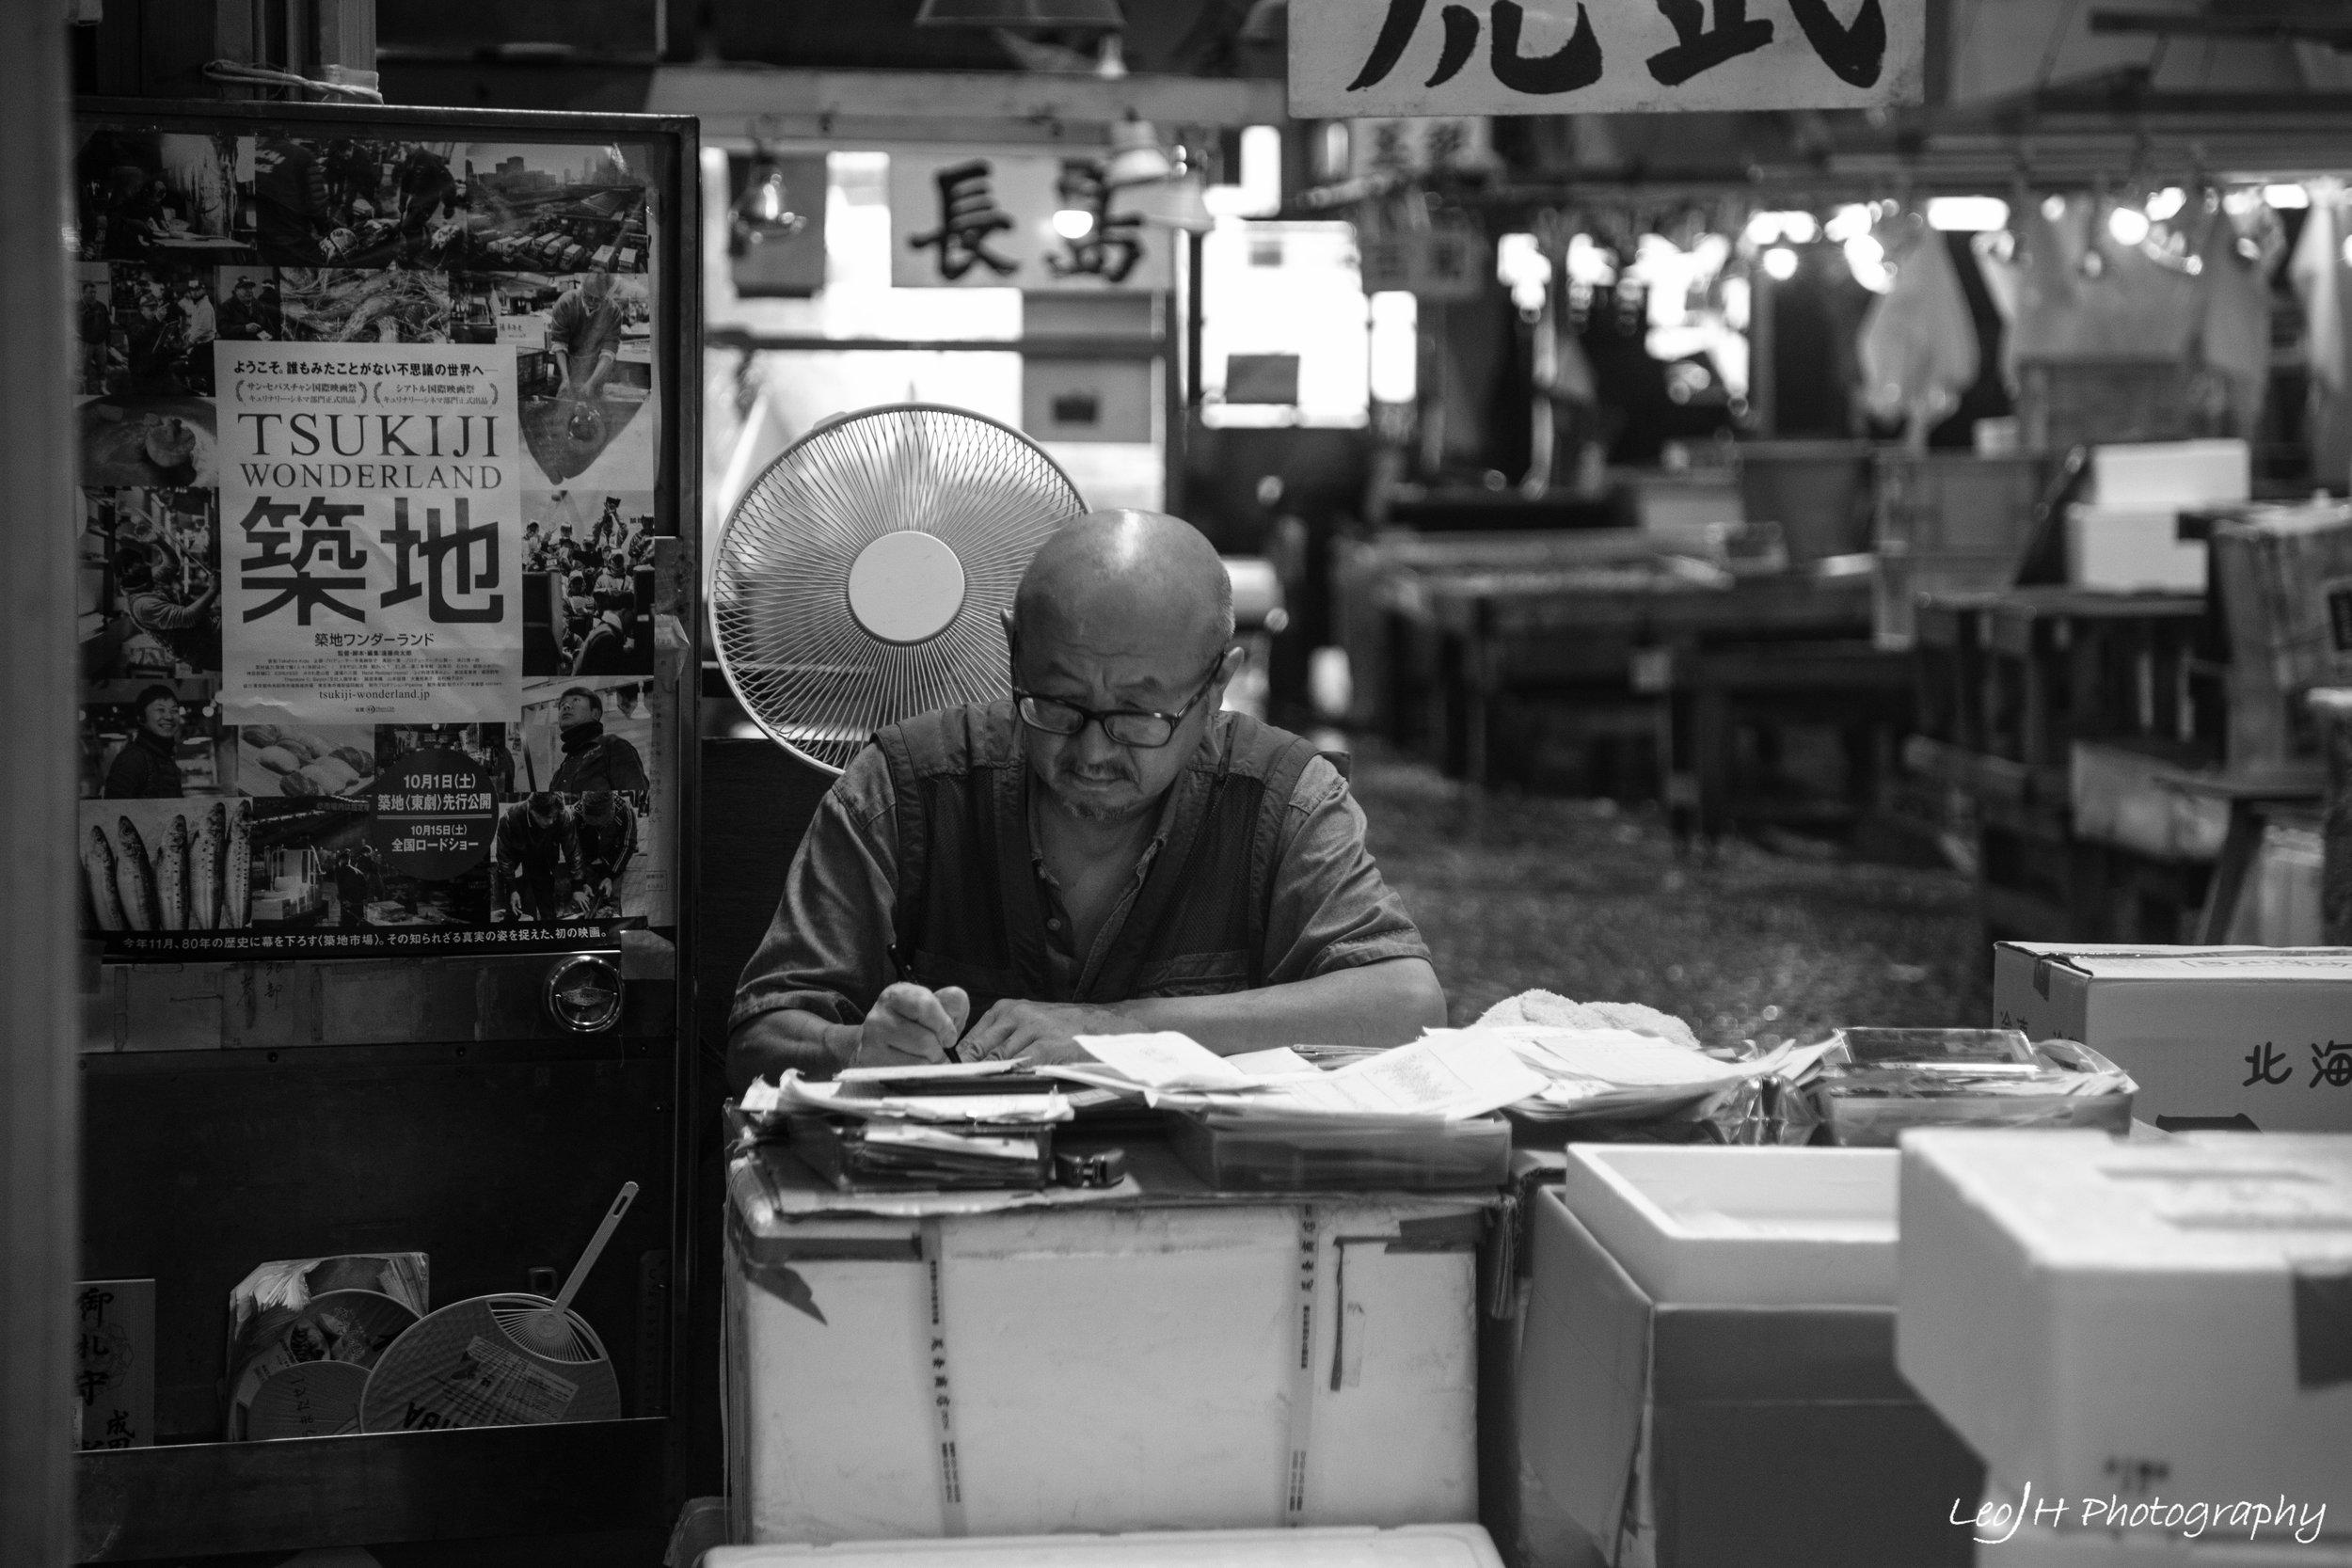 Daily lives of Tsukiji Market sellers: doing accounts